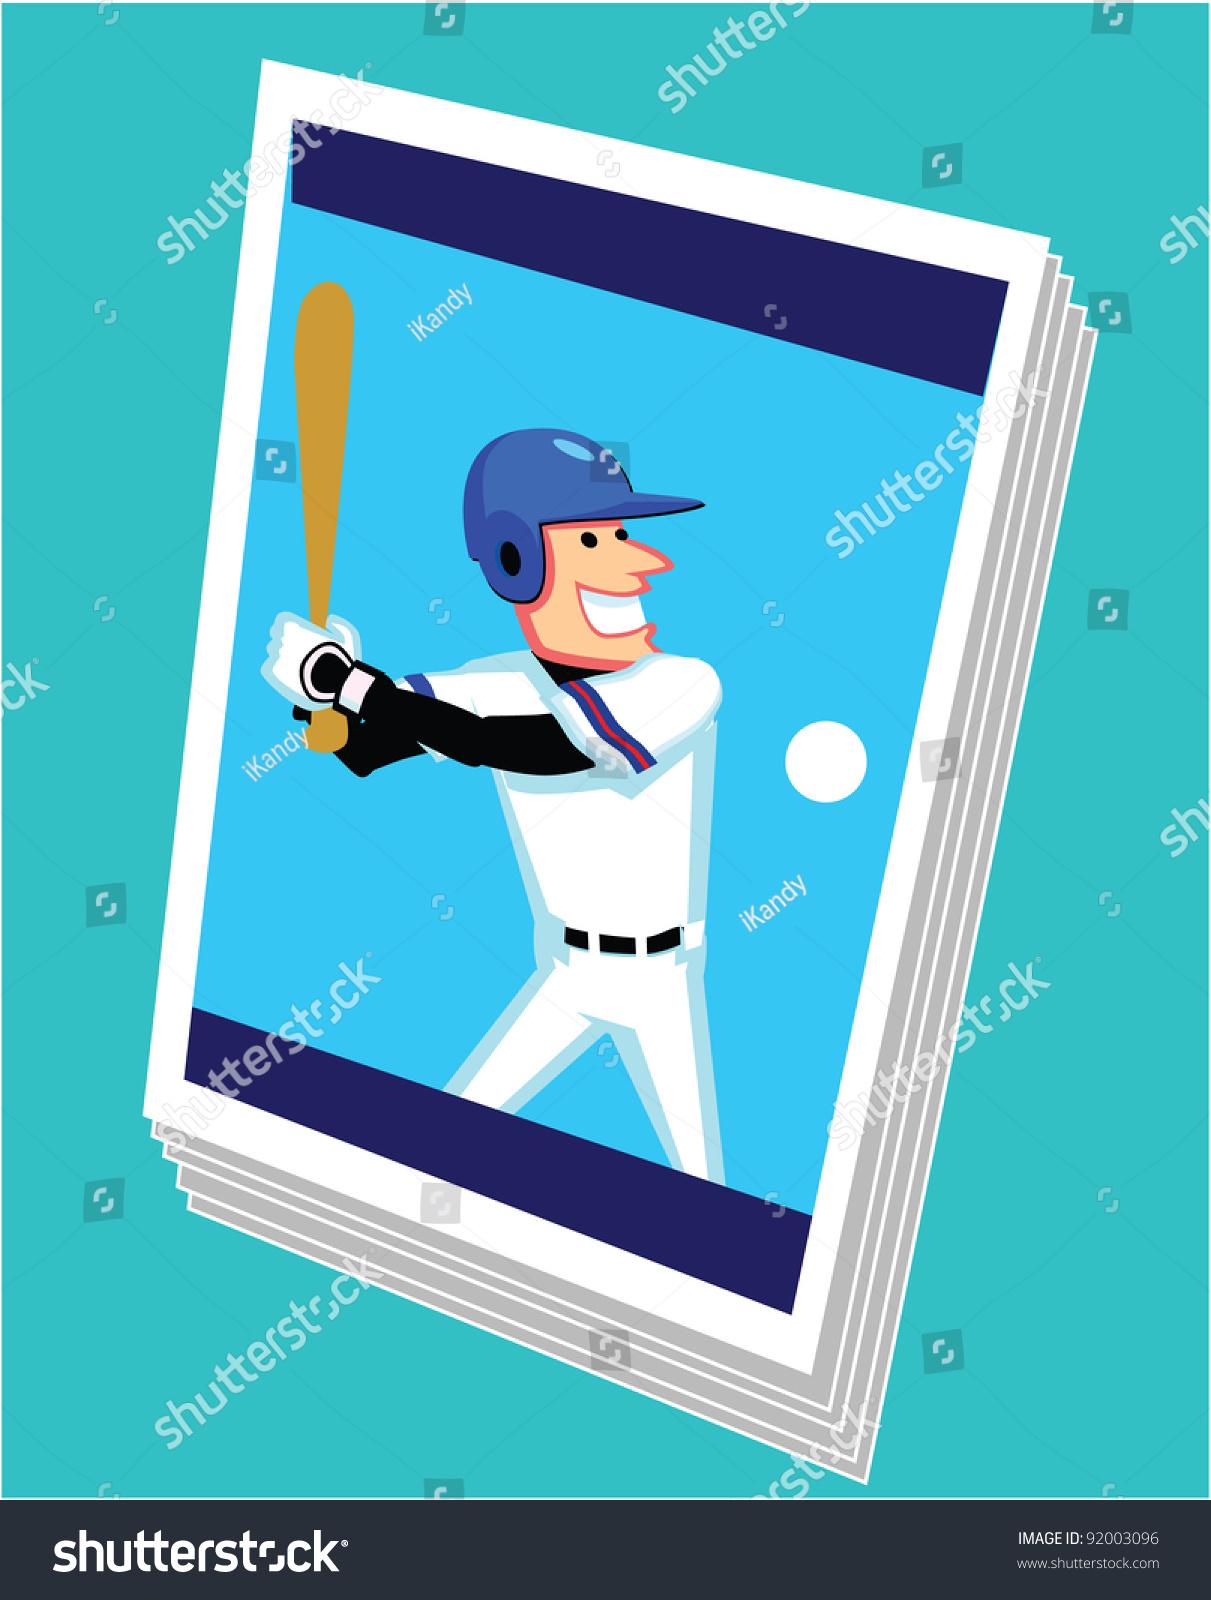 Baseball Card Cartoon Stock Vector (Royalty Free) 92003096.